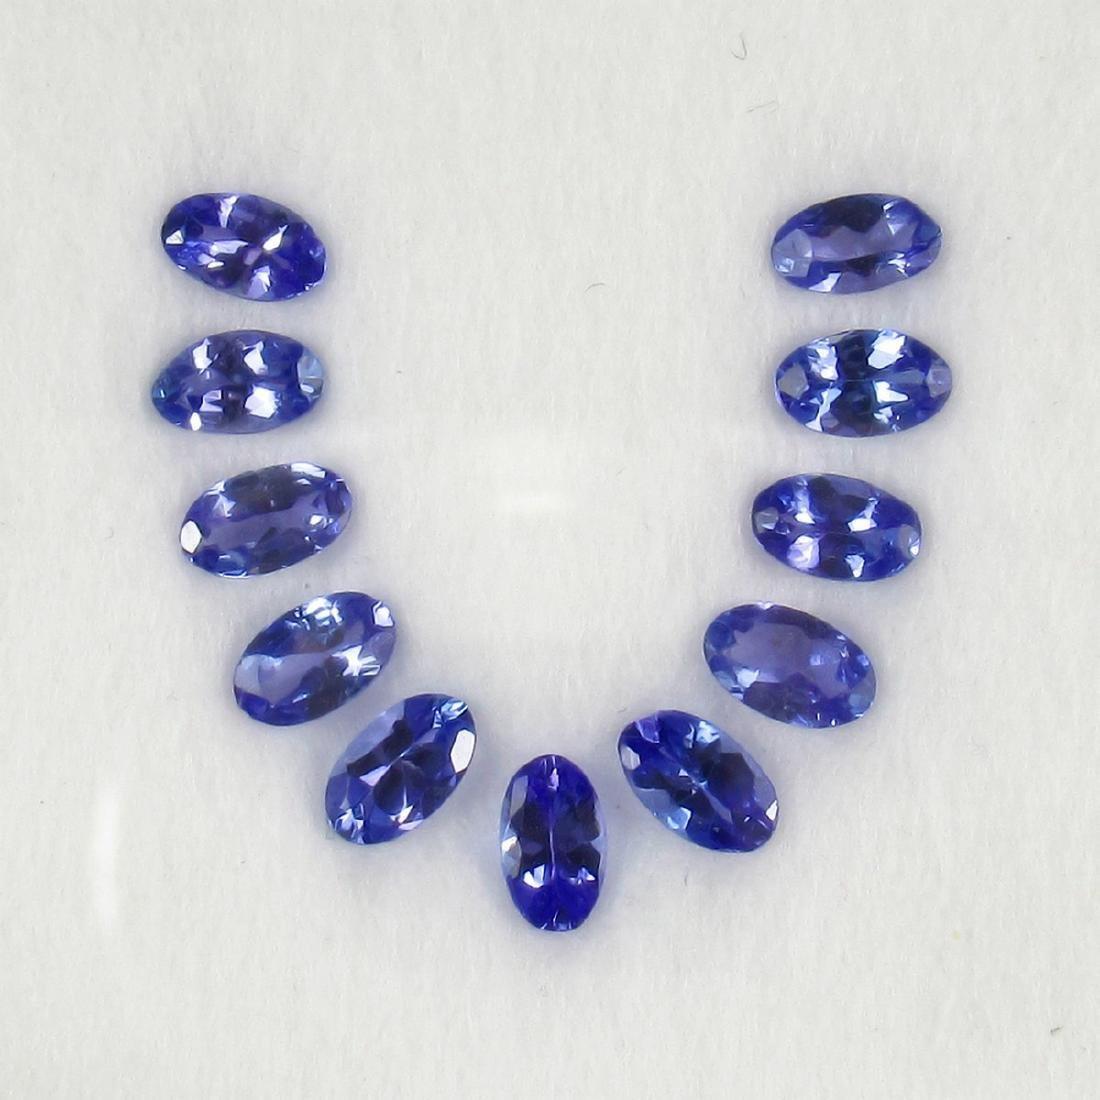 2.71 Carat Natural 11 Loose Tanzanite Oval Necklace Set